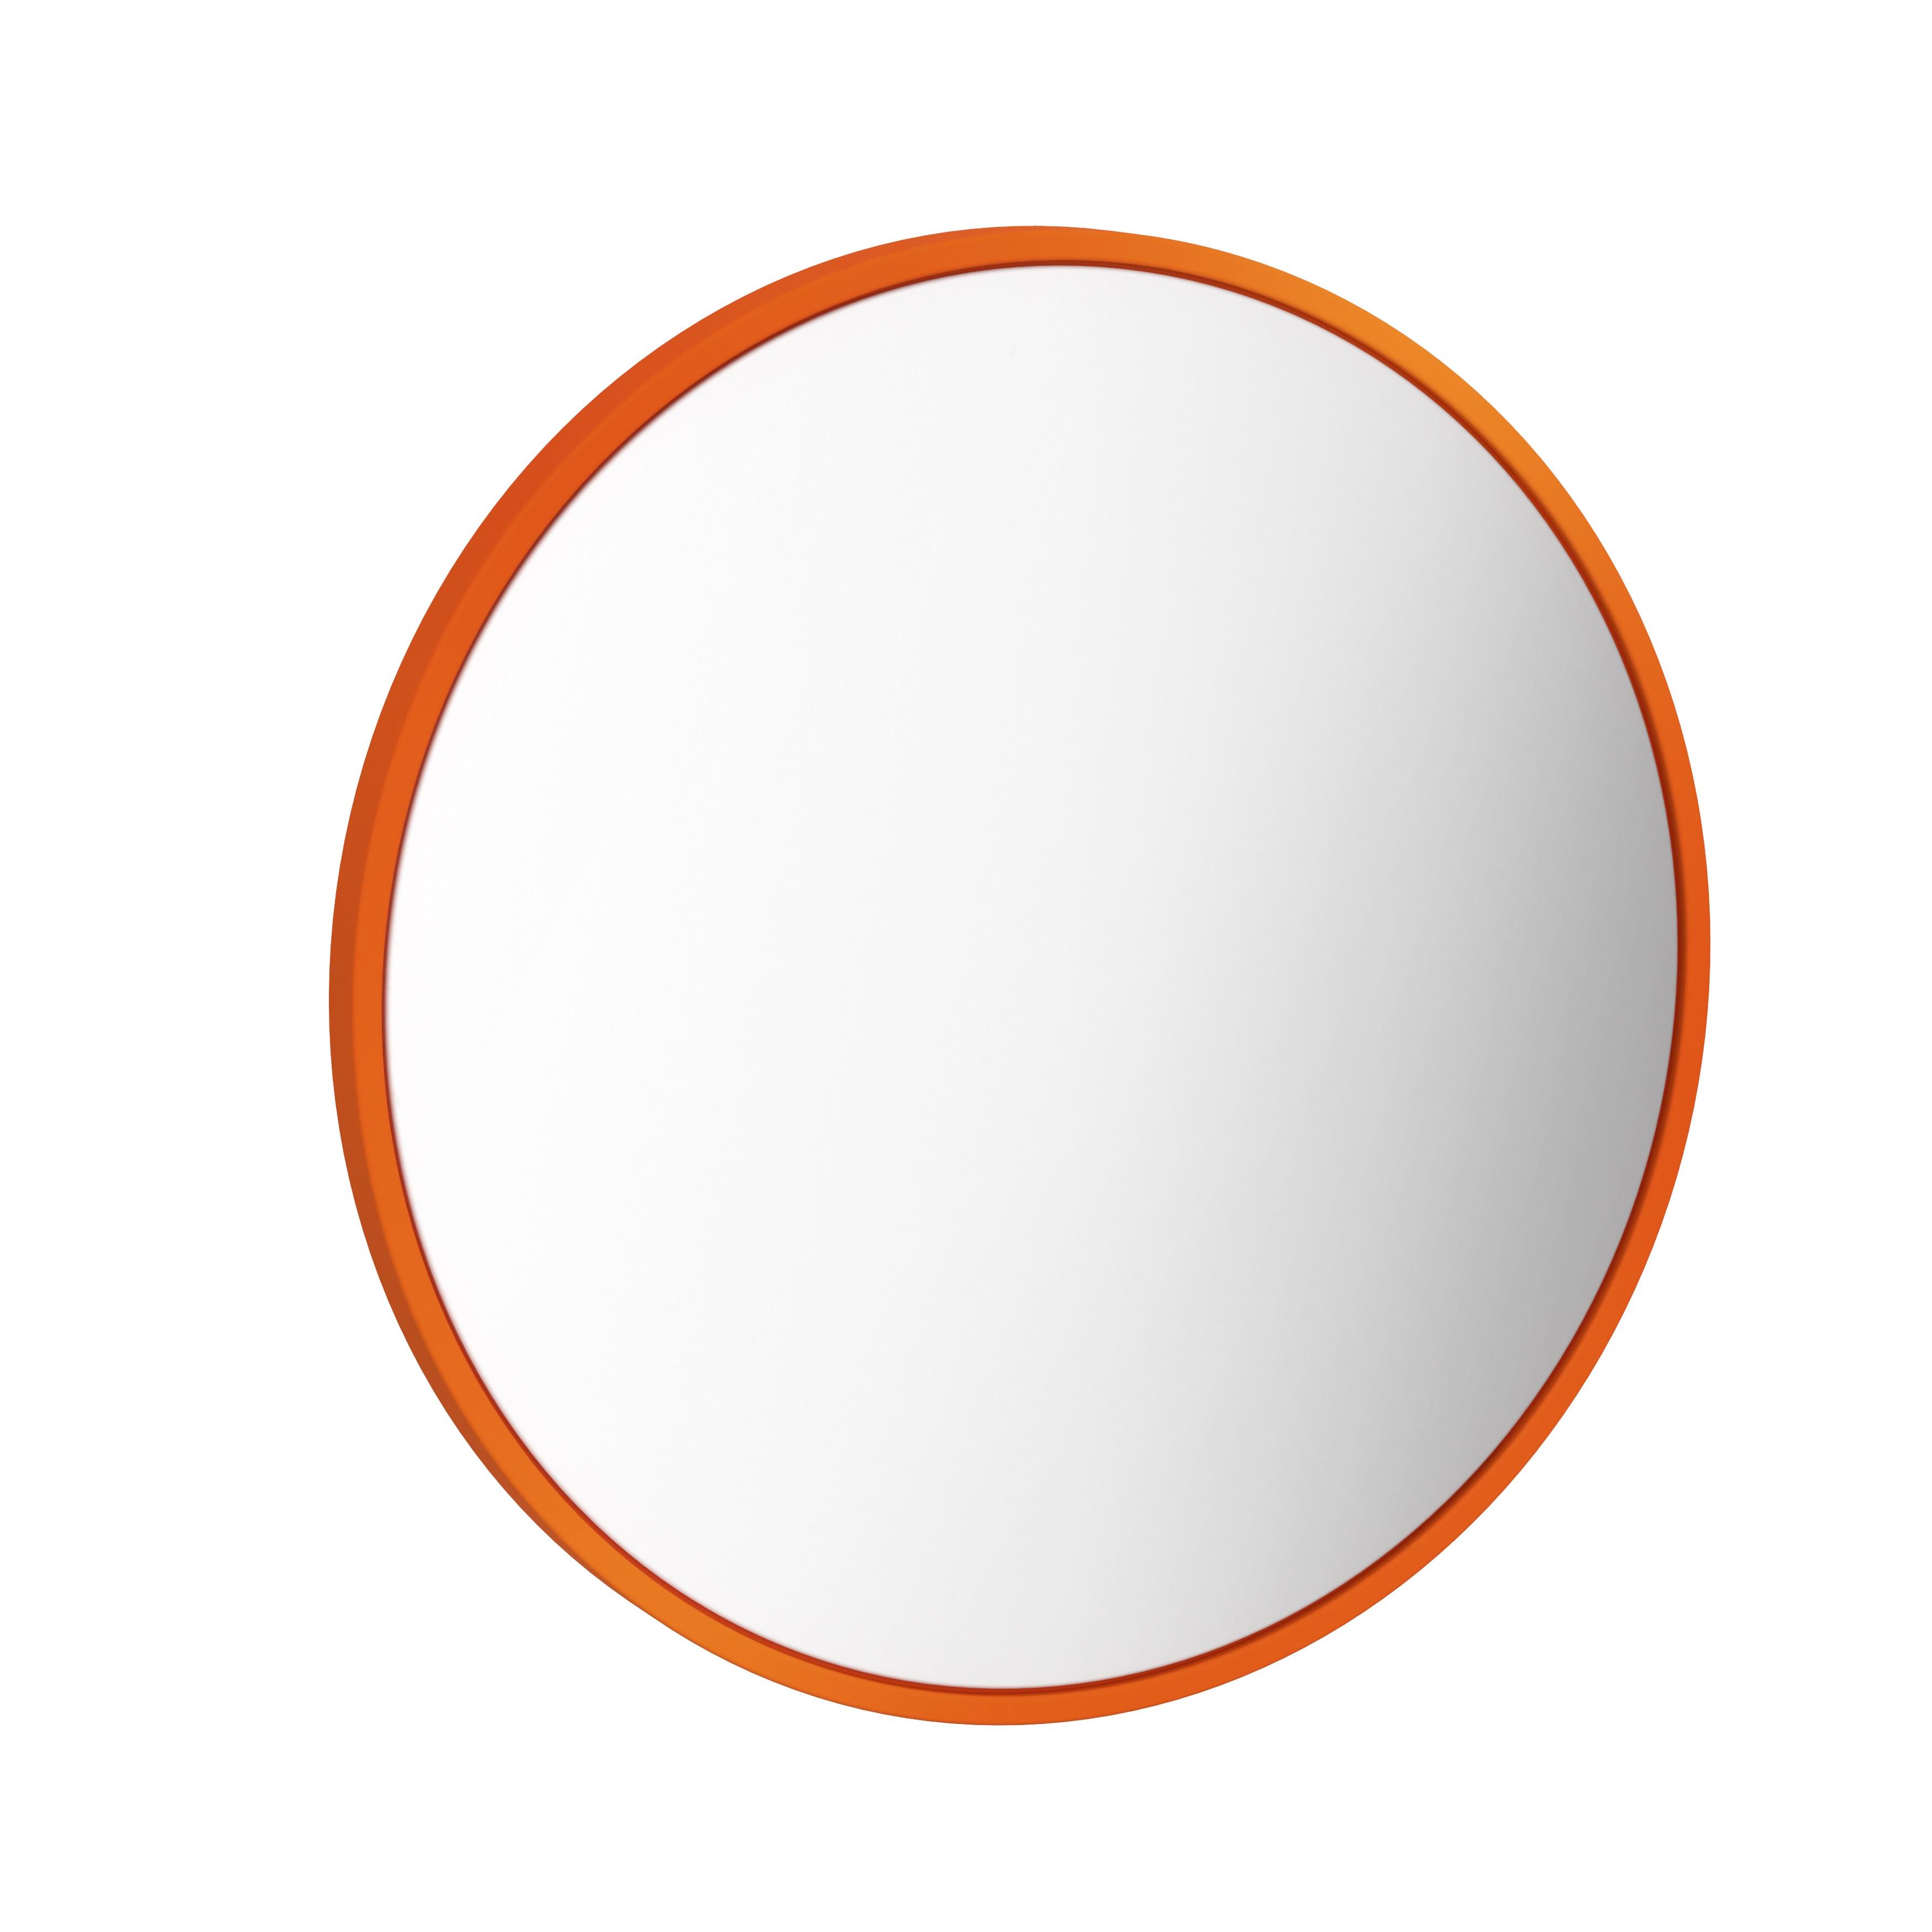 Sento Kids miroir ronde, 40 cm, orange